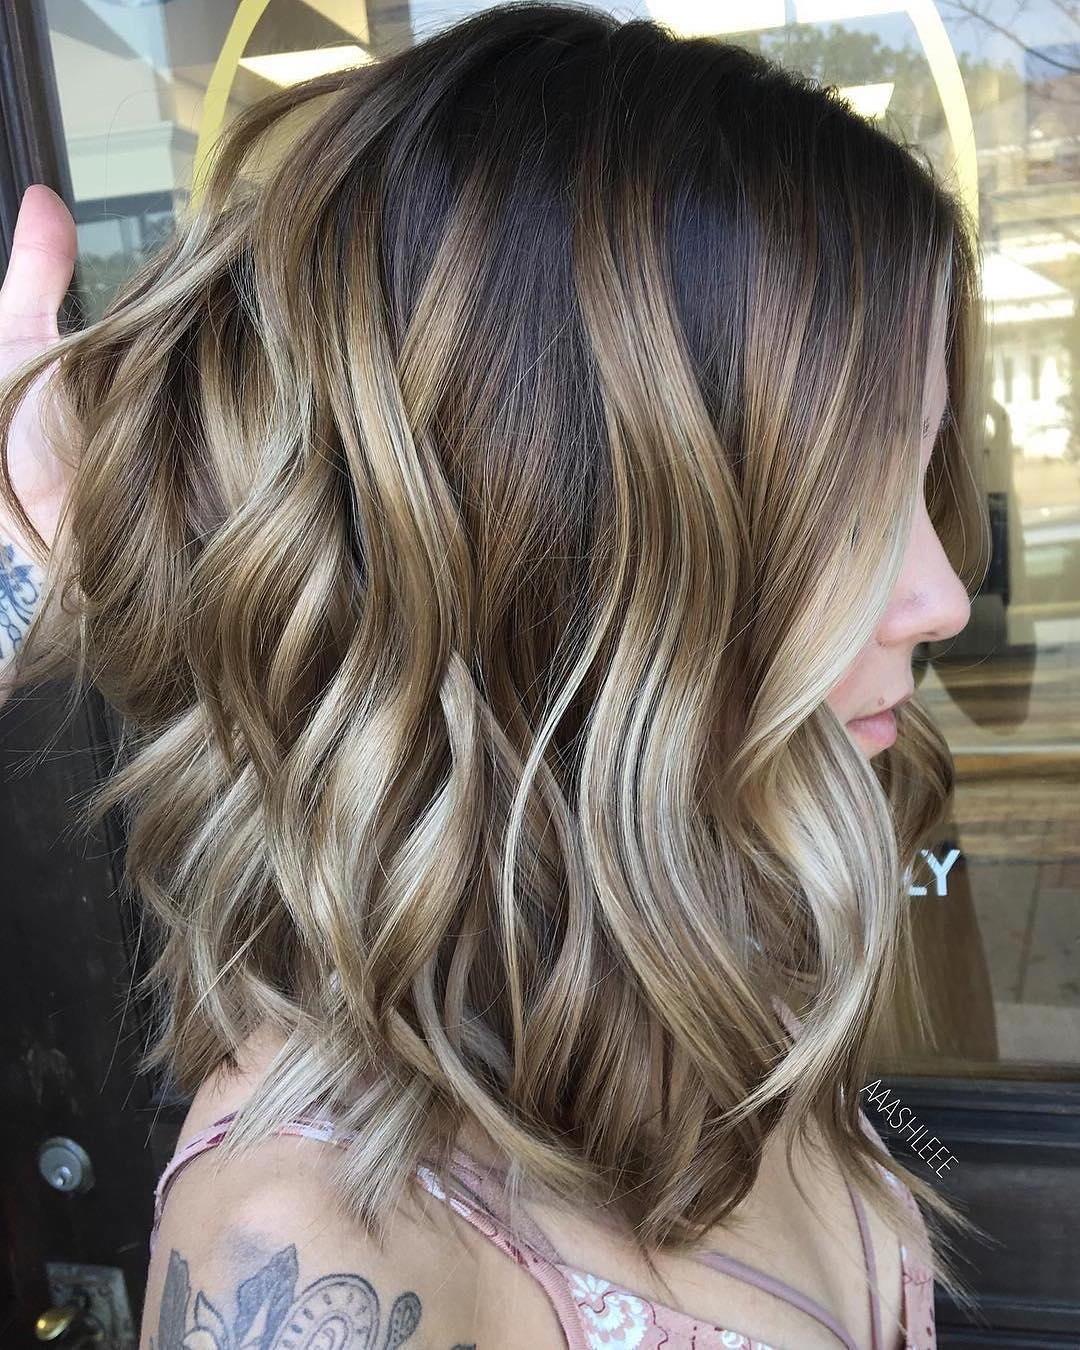 Trendy Medium Blonde Balayage Hairstyles Throughout 10 Ombre Balayage Hairstyles For Medium Length Hair, Hair Color (View 6 of 20)